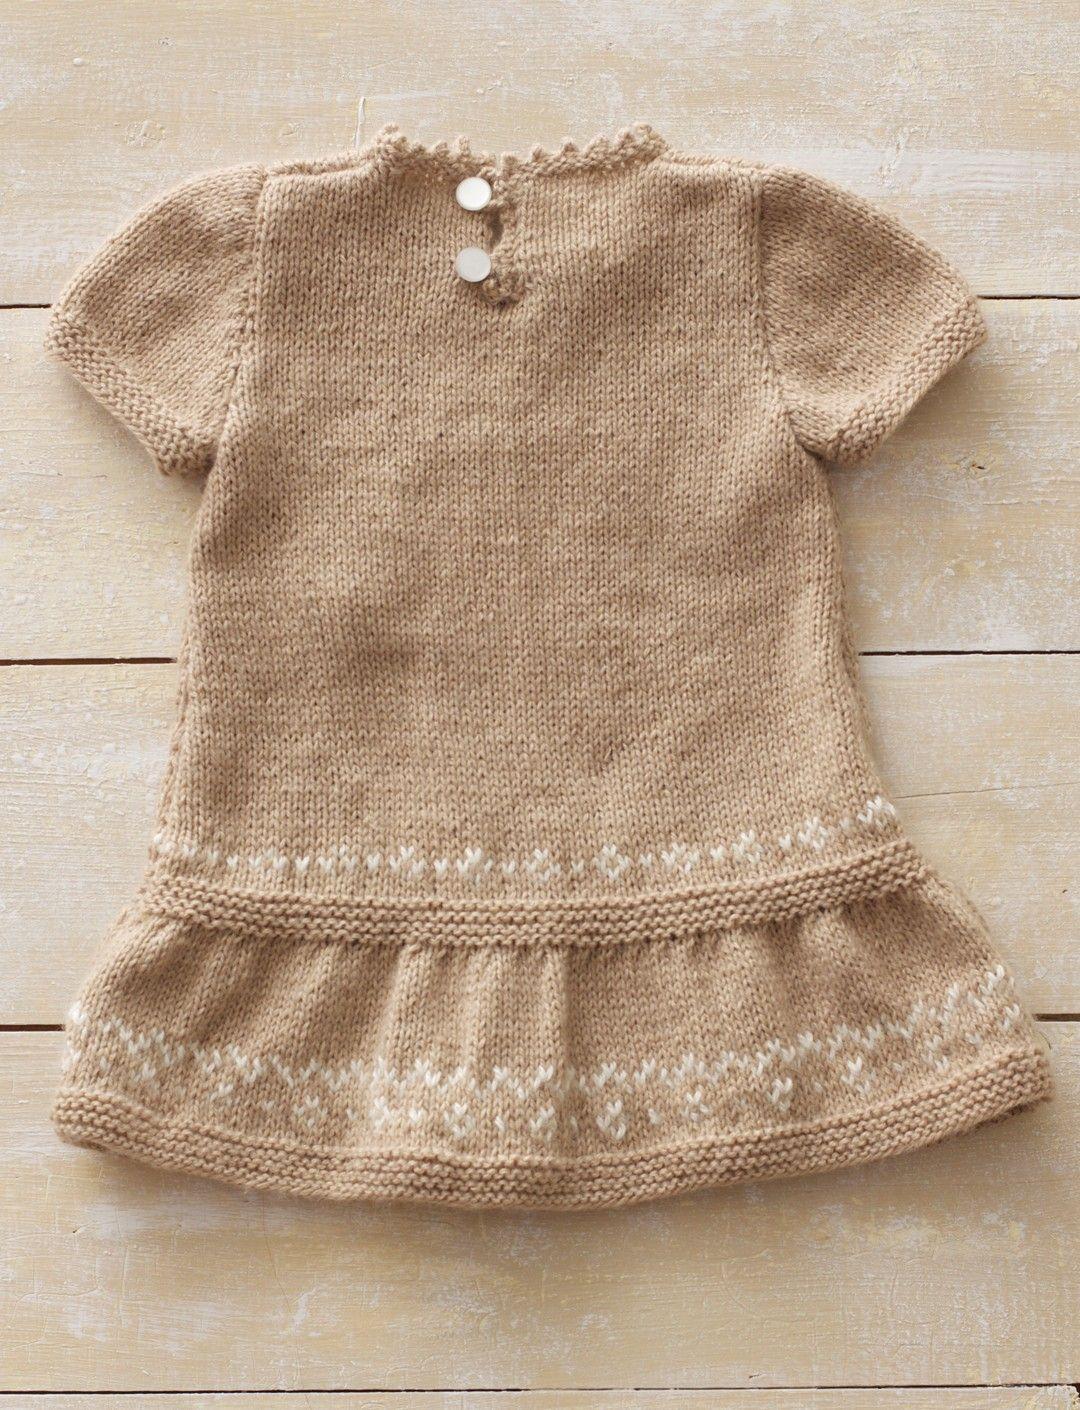 Yarnspirations.com - Bernat Honey Bunny Dress - Patterns ...